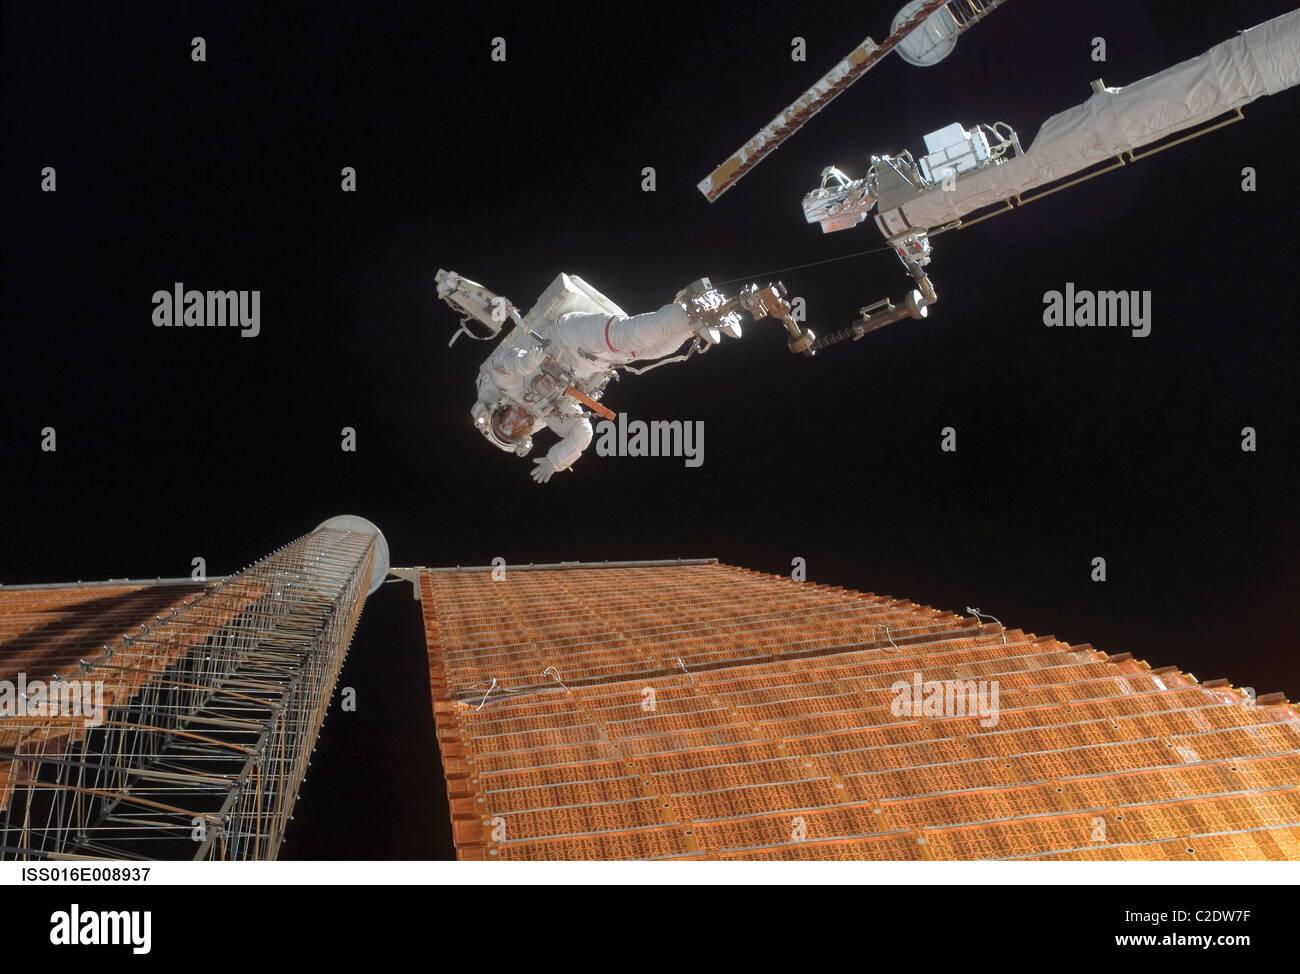 Astronaut participates in extravehicular activity - Stock Image